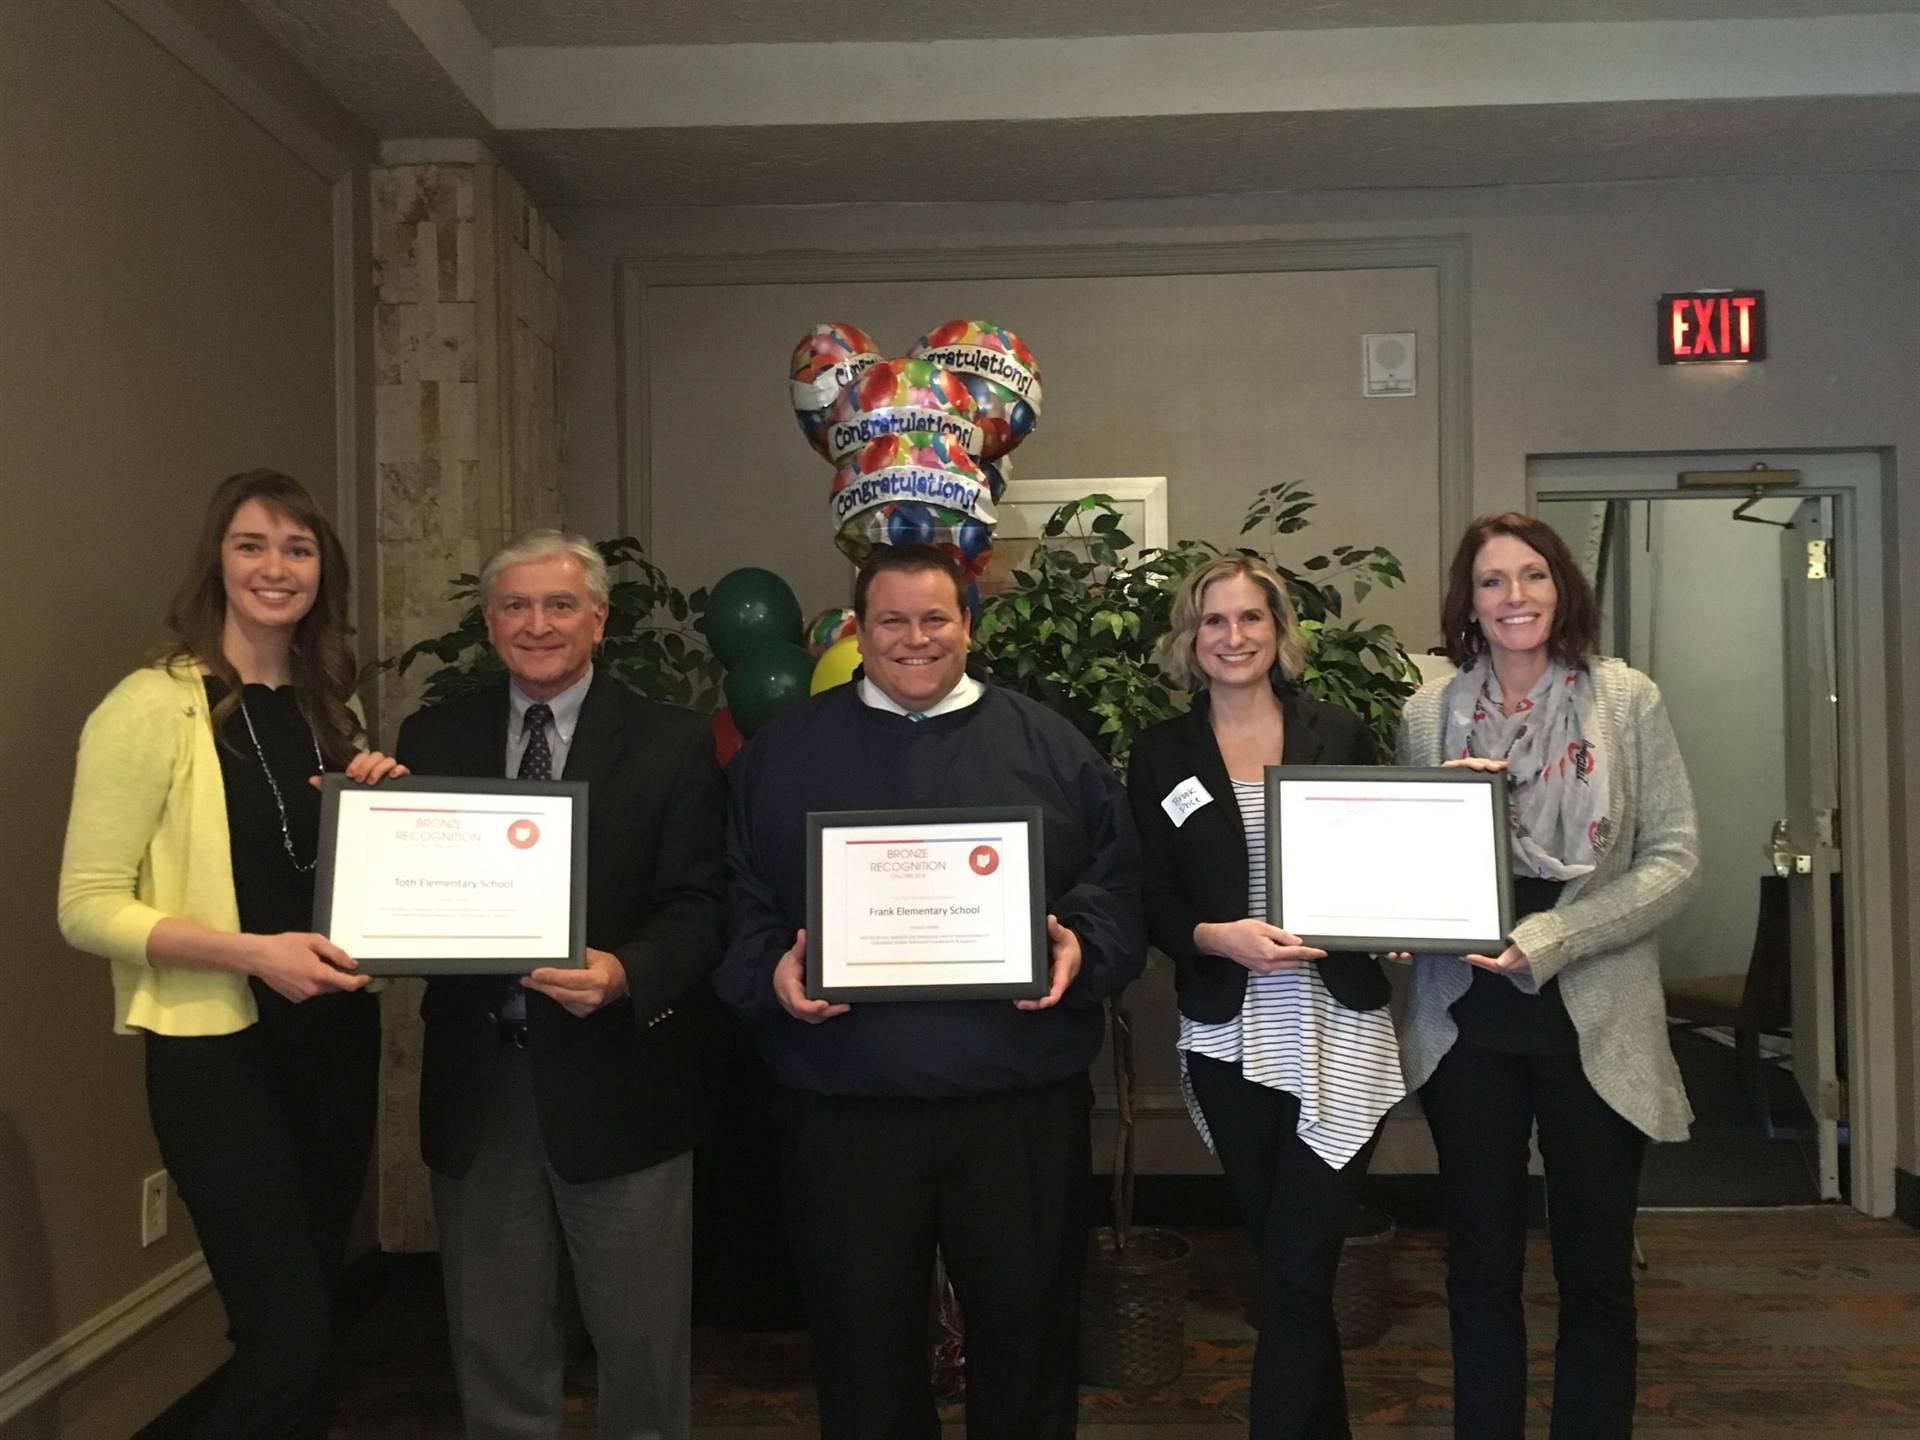 PBIS Award Group Photo